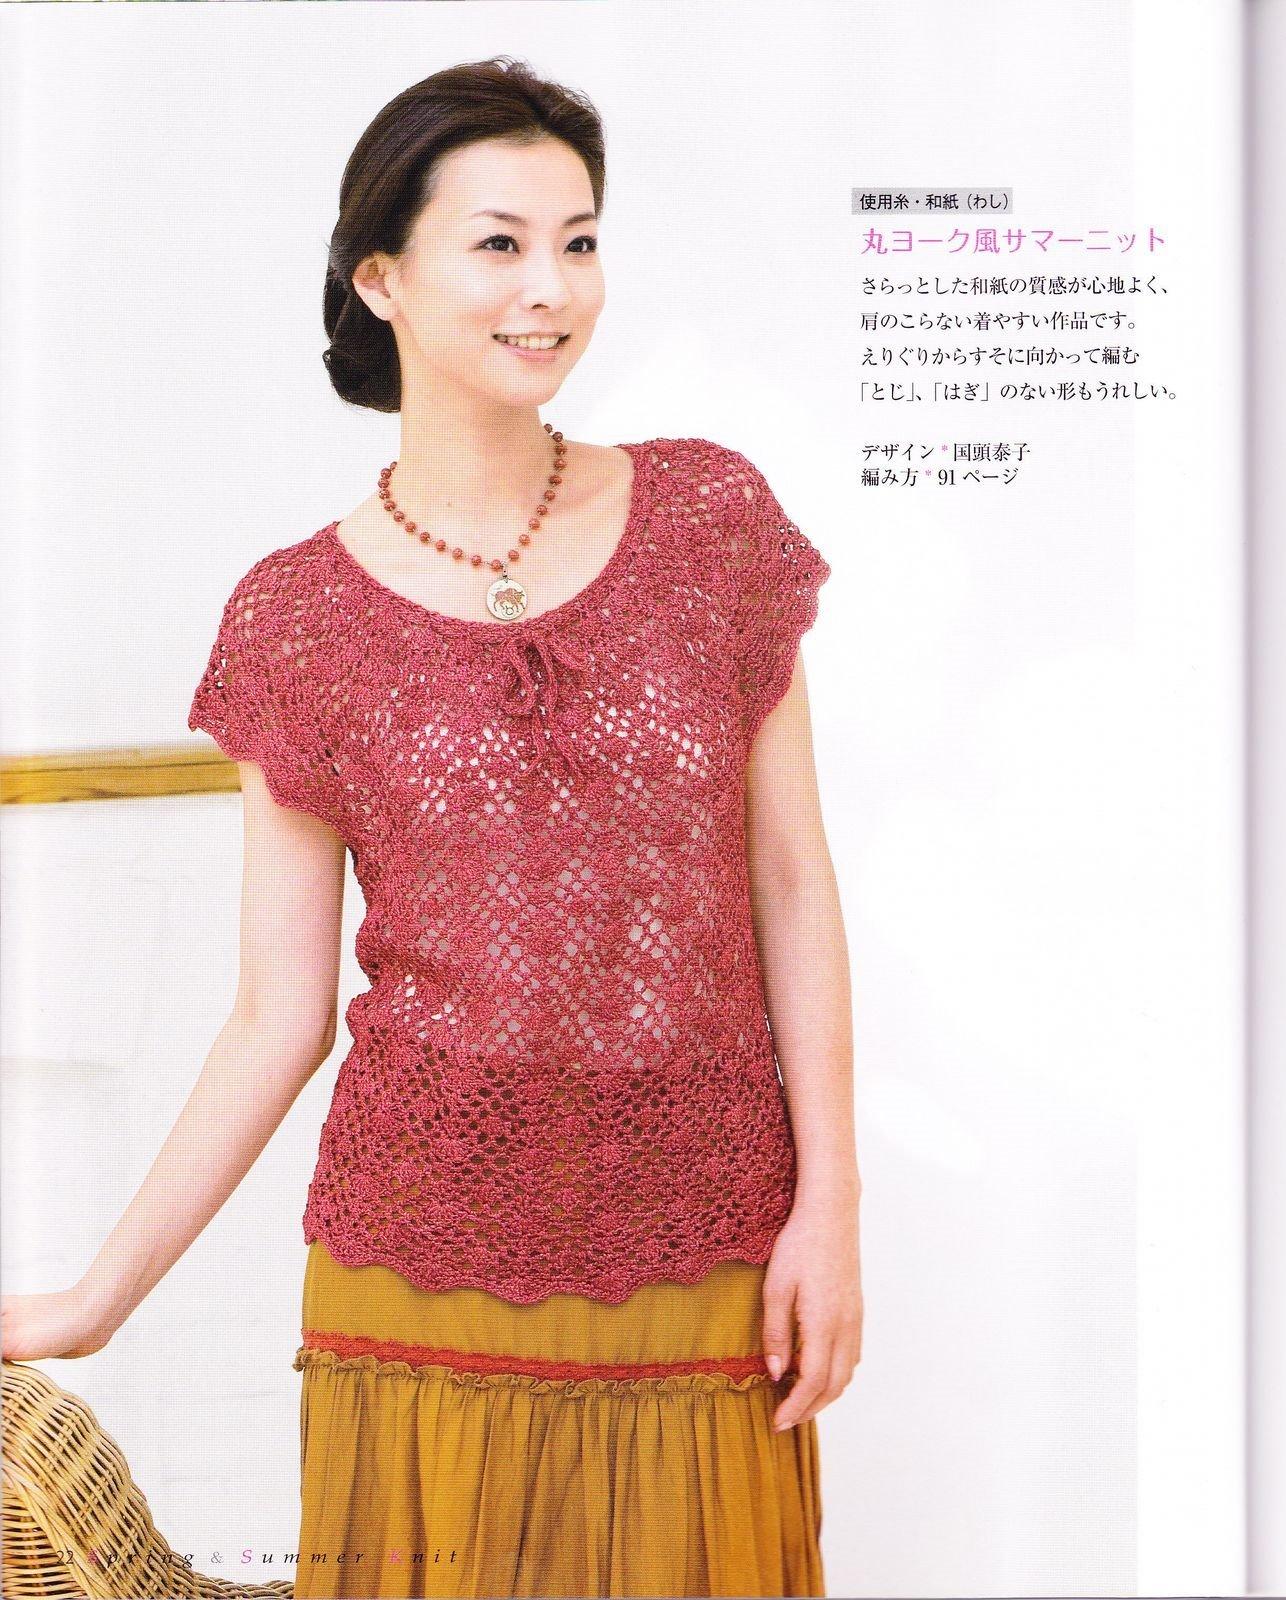 Блузки Кофточки Крючком Из Японских Журналов